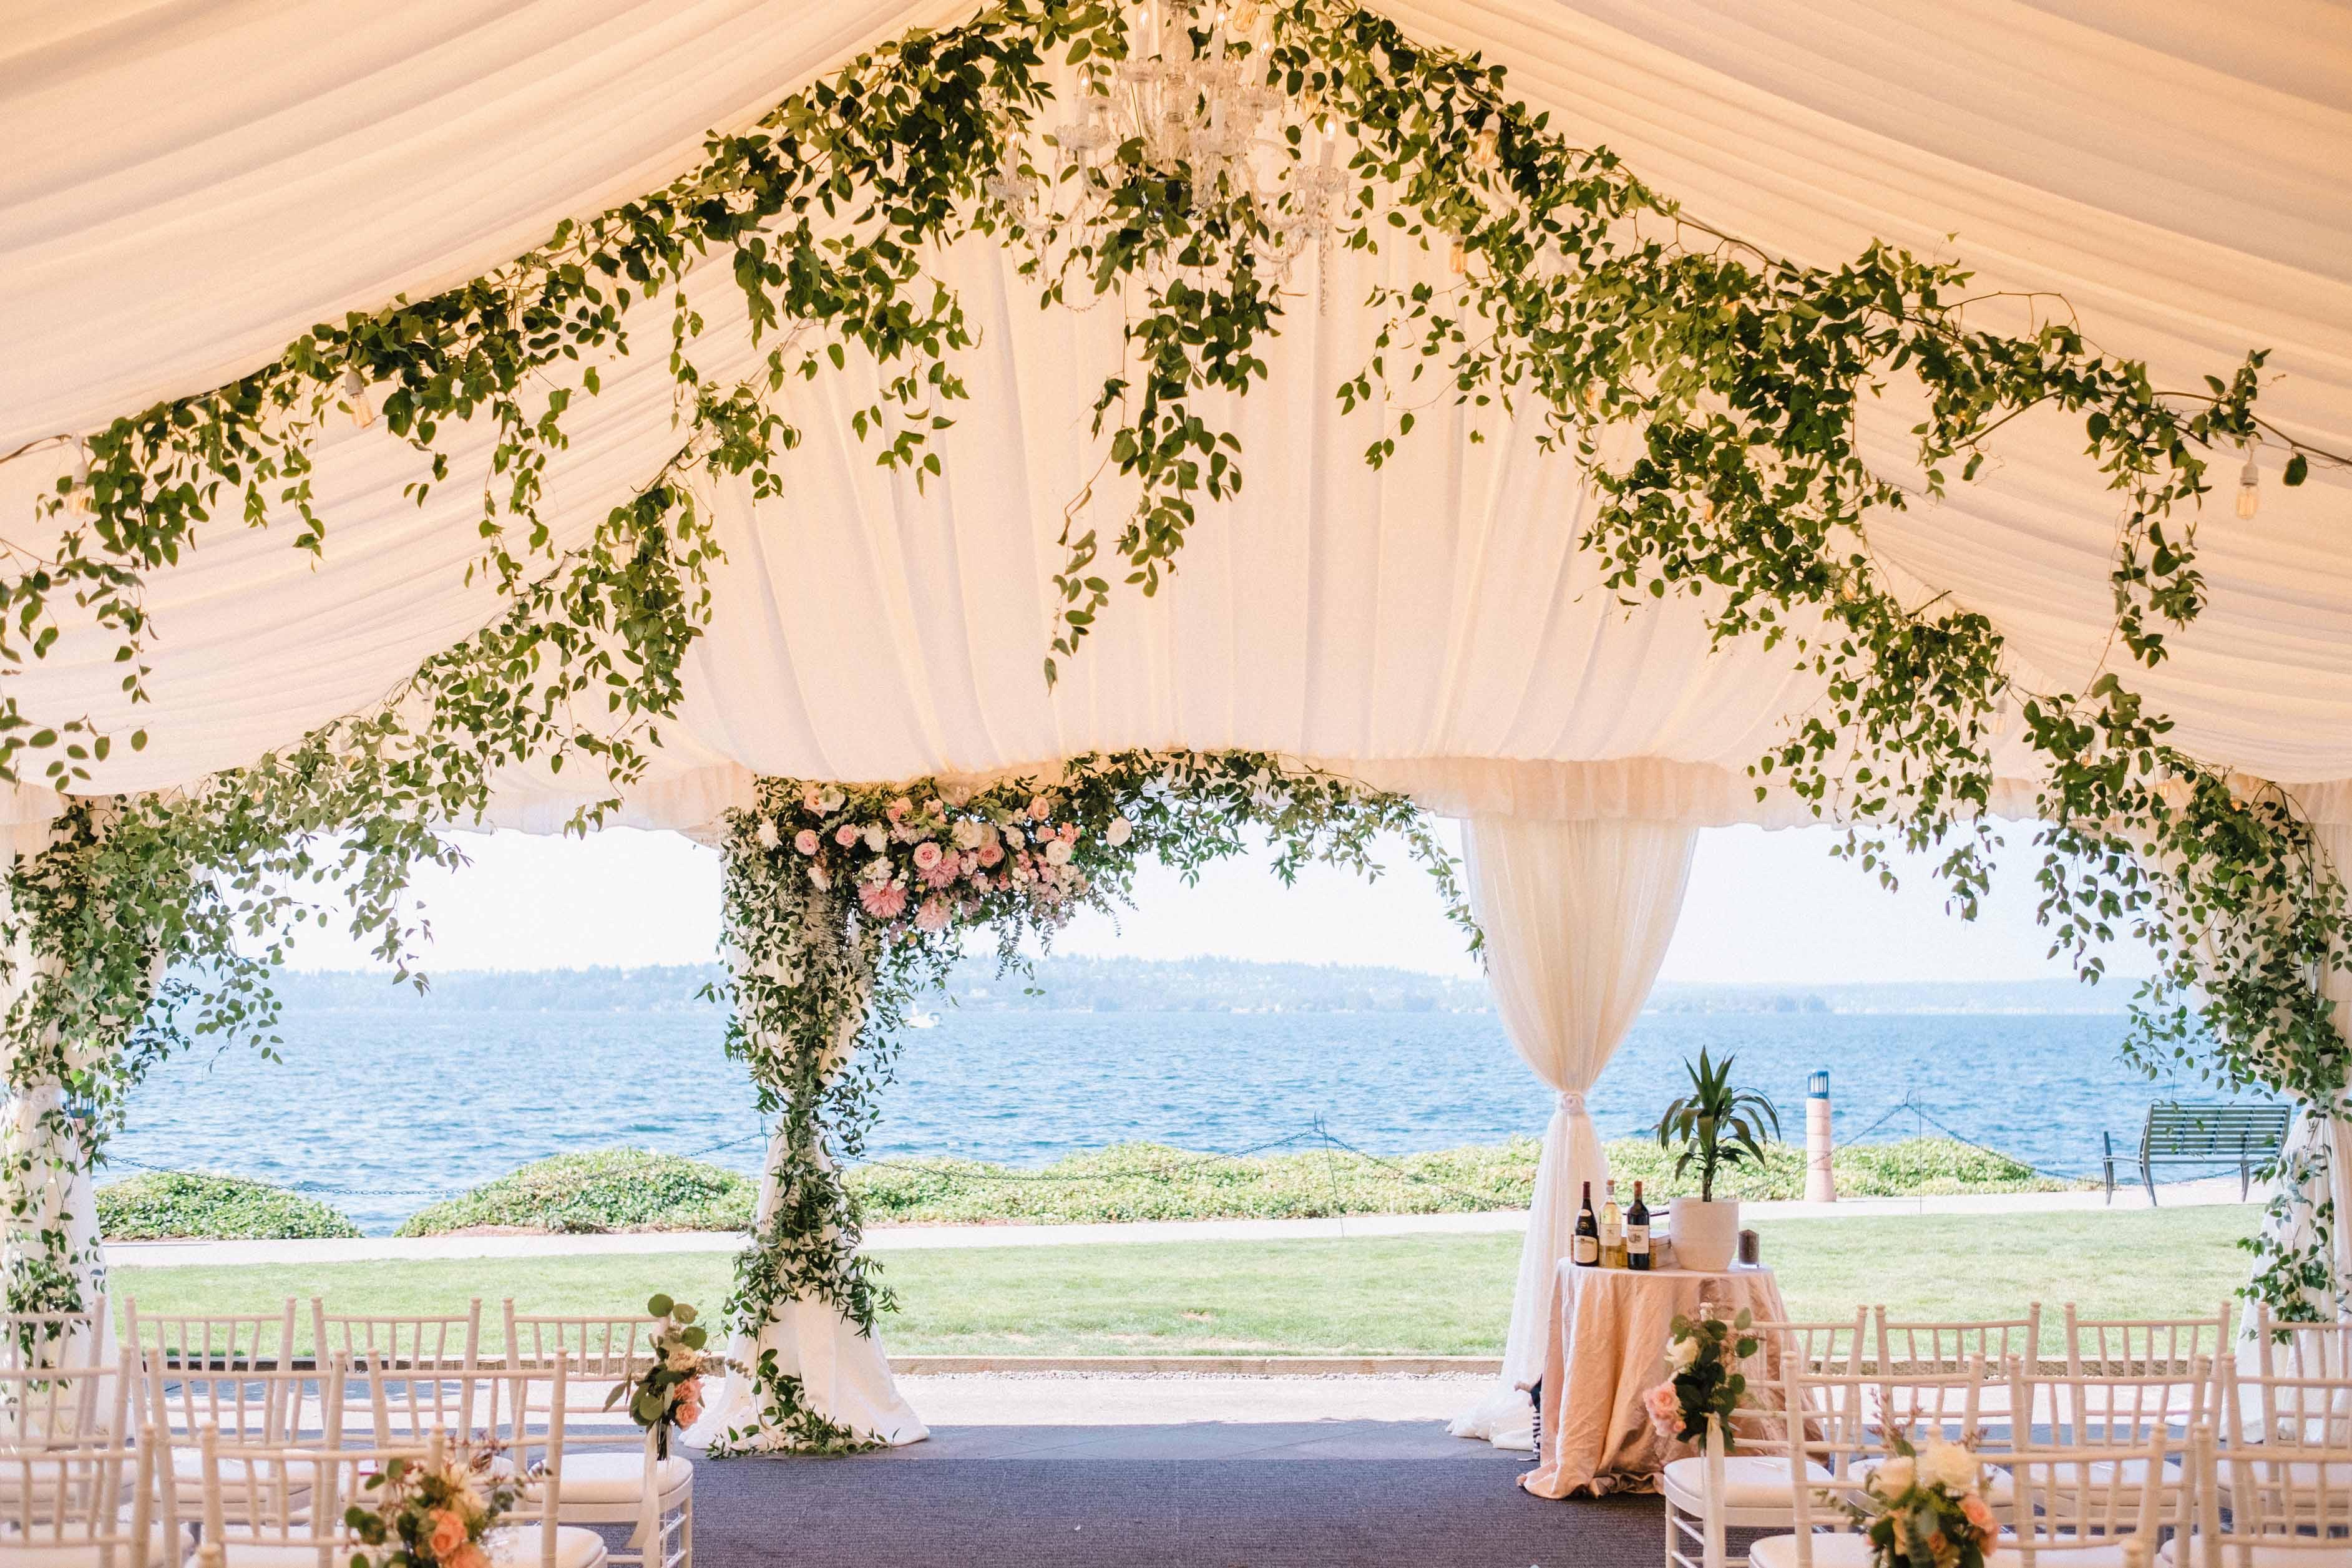 Ceiling greenery at the Woodmark Hotel - Woodmark Hotel Wedding by Flora Nova Design Seattle